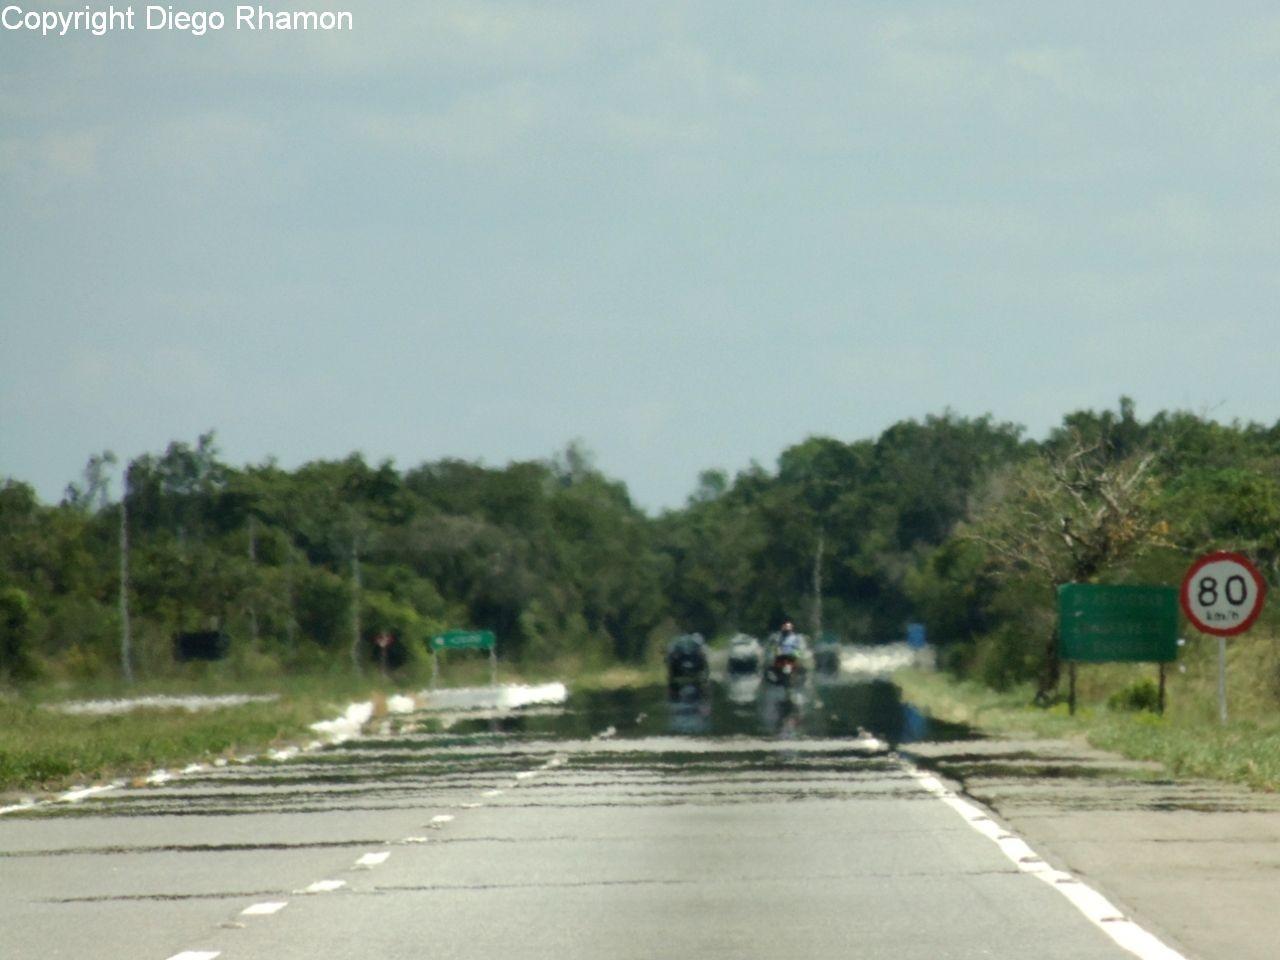 Miragem vista em Santa Rita, Paraíba, em 19/04/2014.